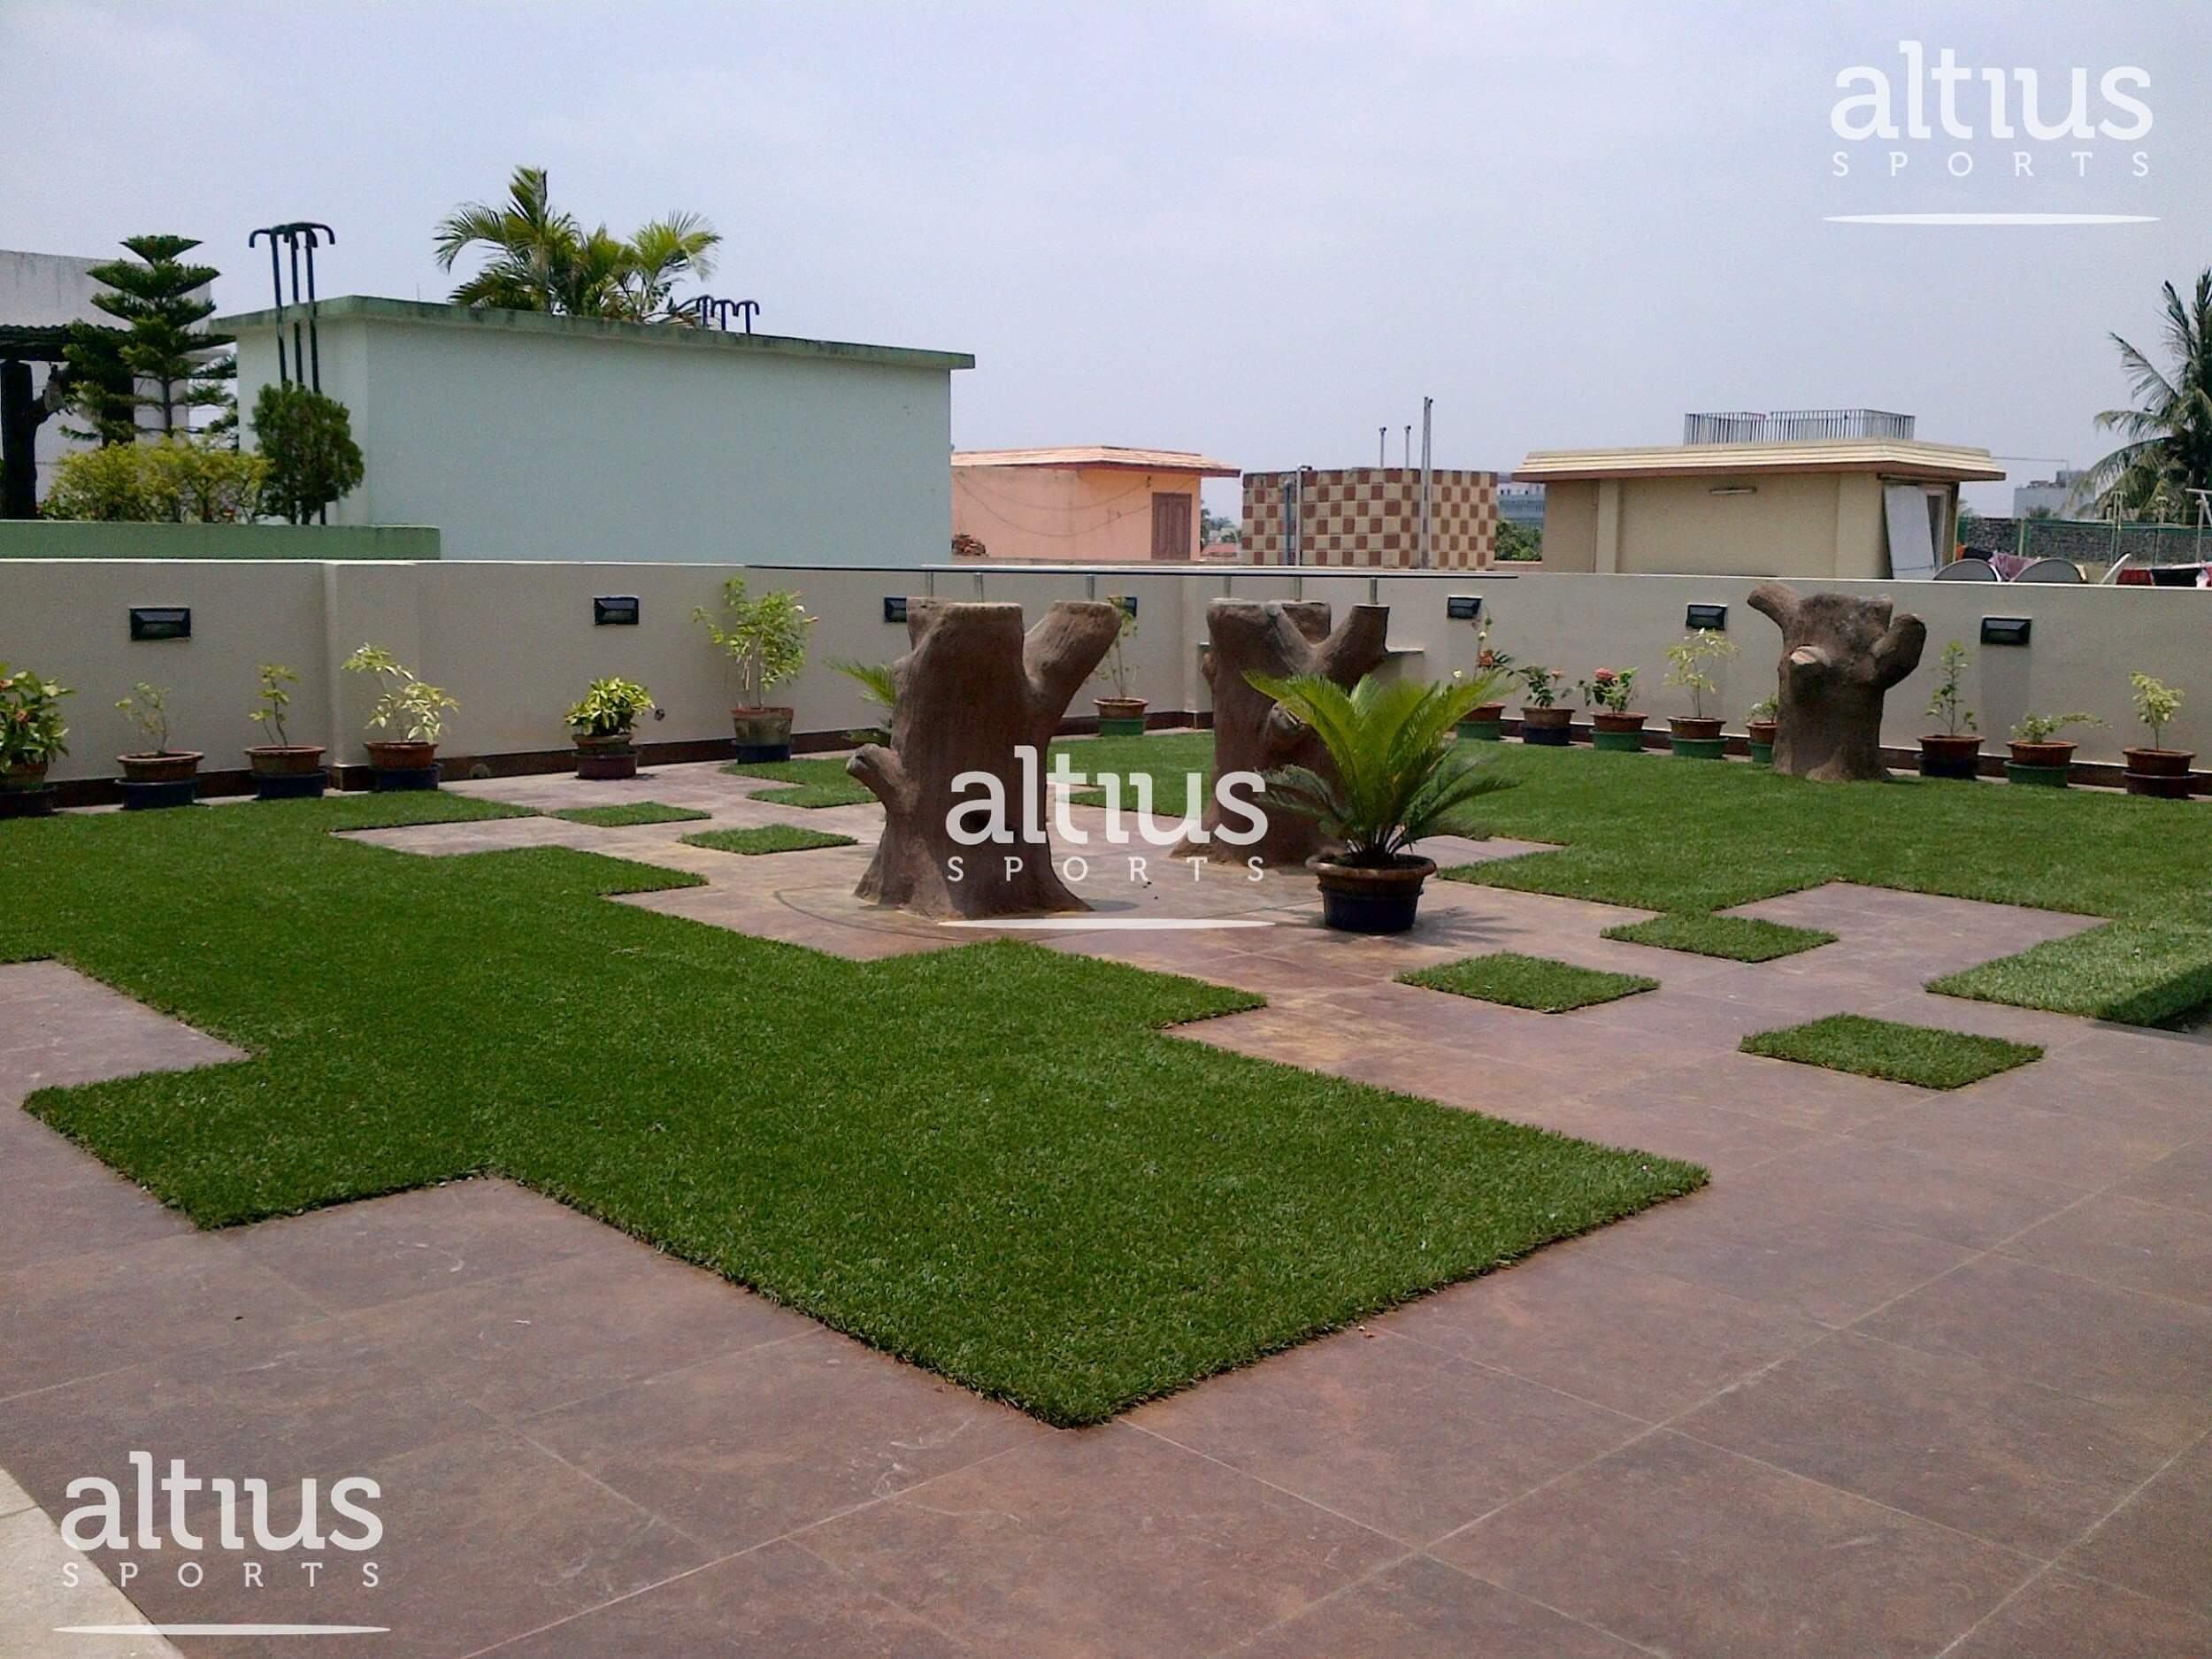 altius-grass-saves-water